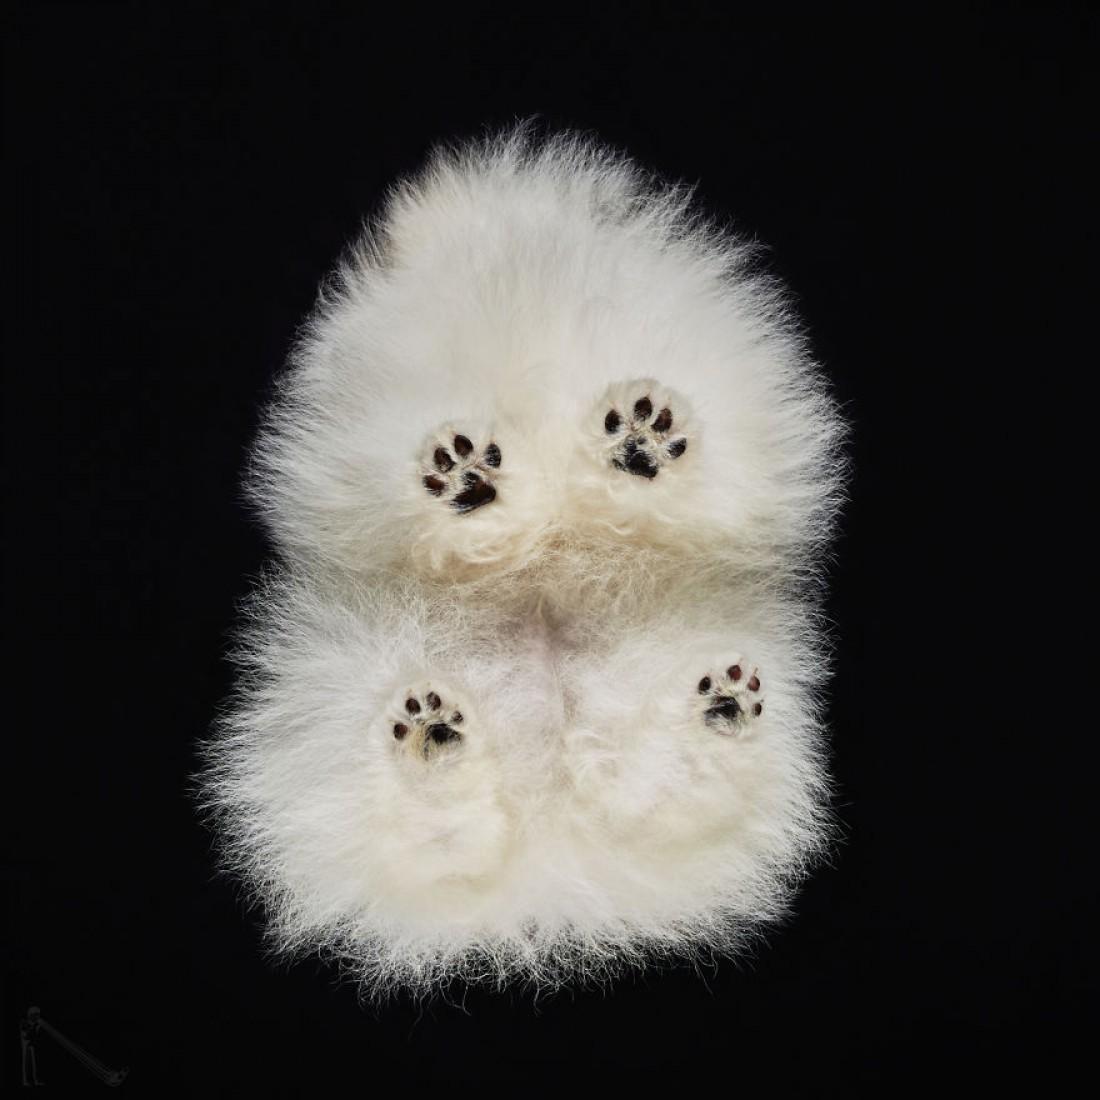 Милый щенок - вид снизу